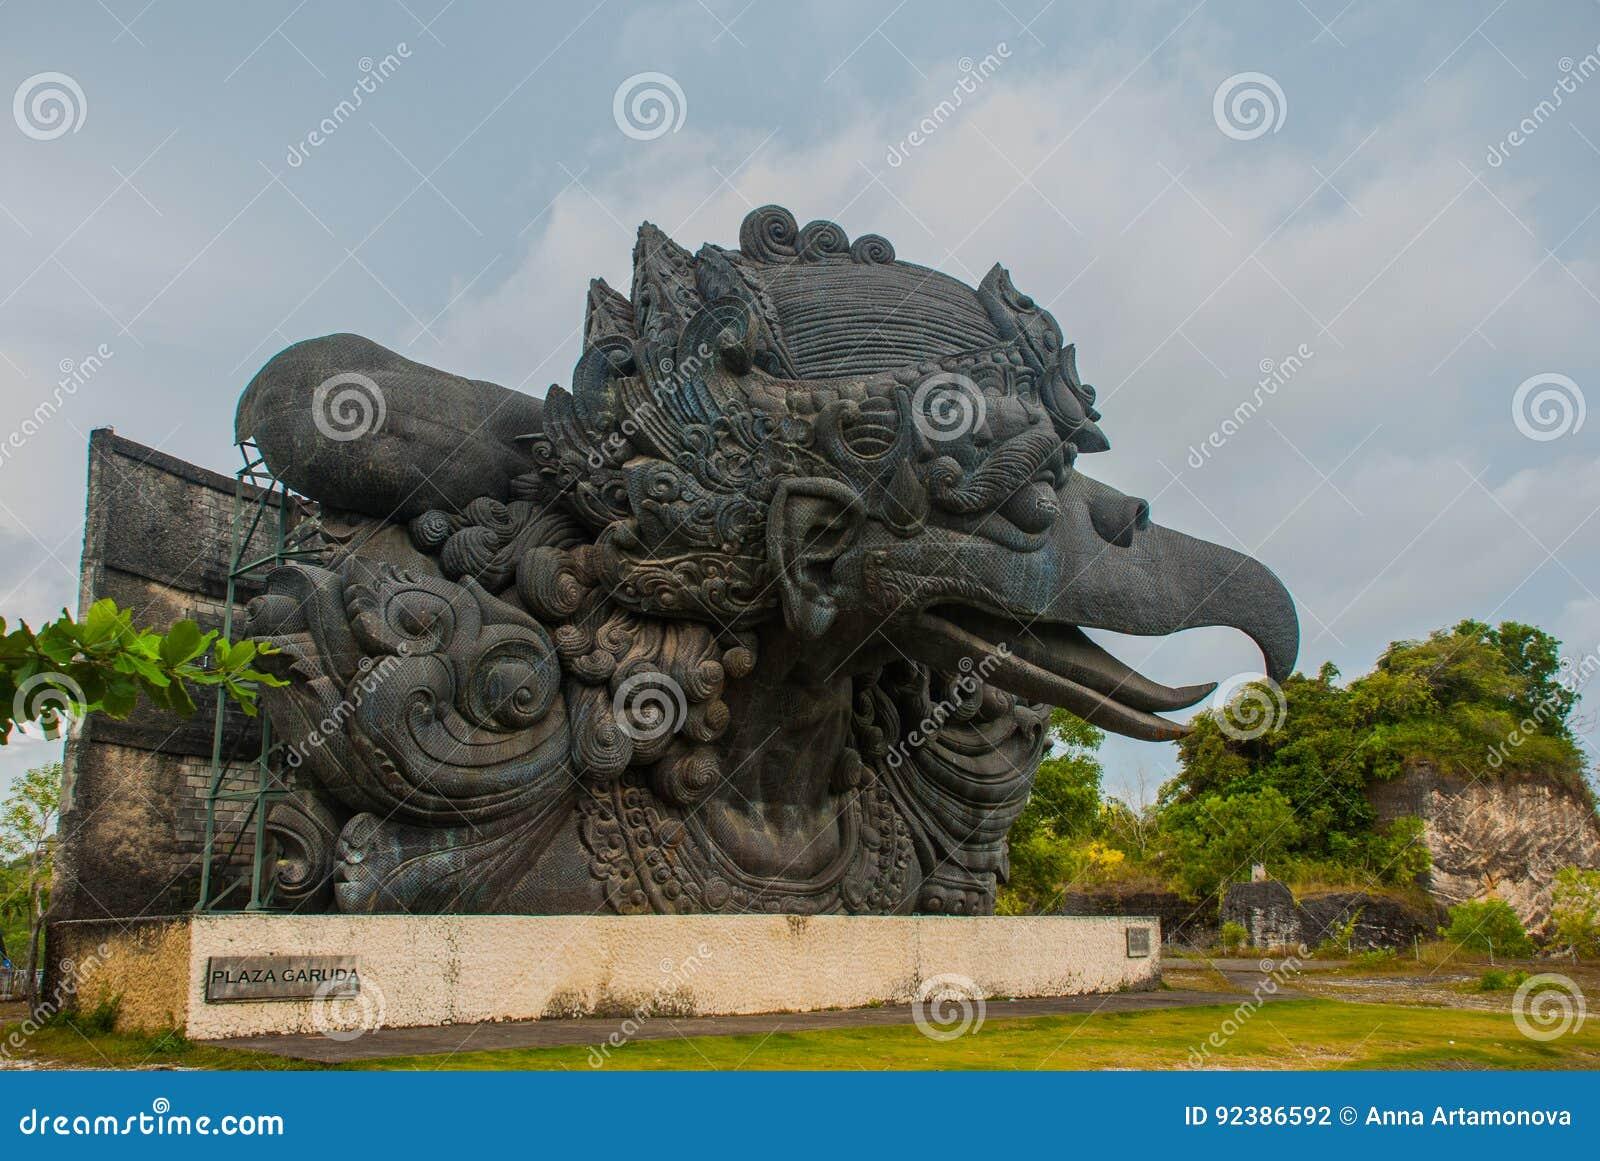 Garuda Statue Garuda Wisnu Kencana Cultural Park Bali Indonesia